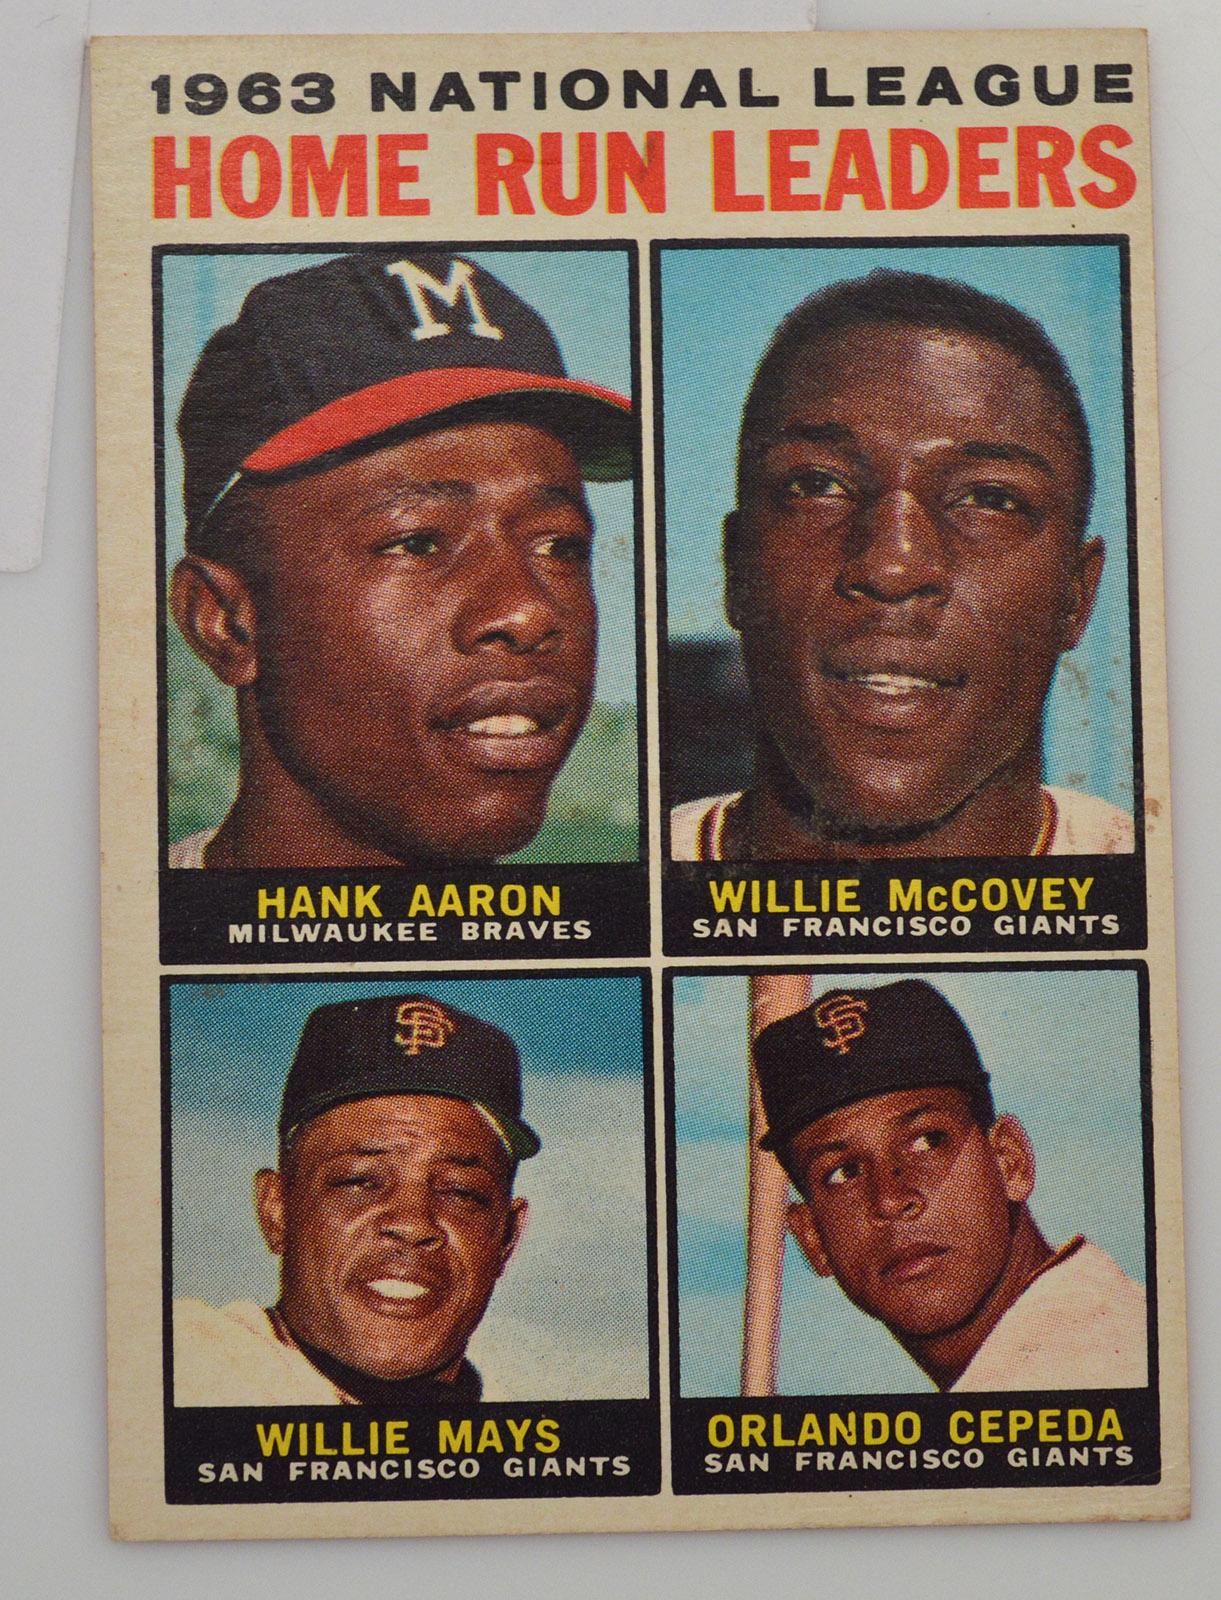 1964 63 National League Home Run Leaders Hank Aaron Willie